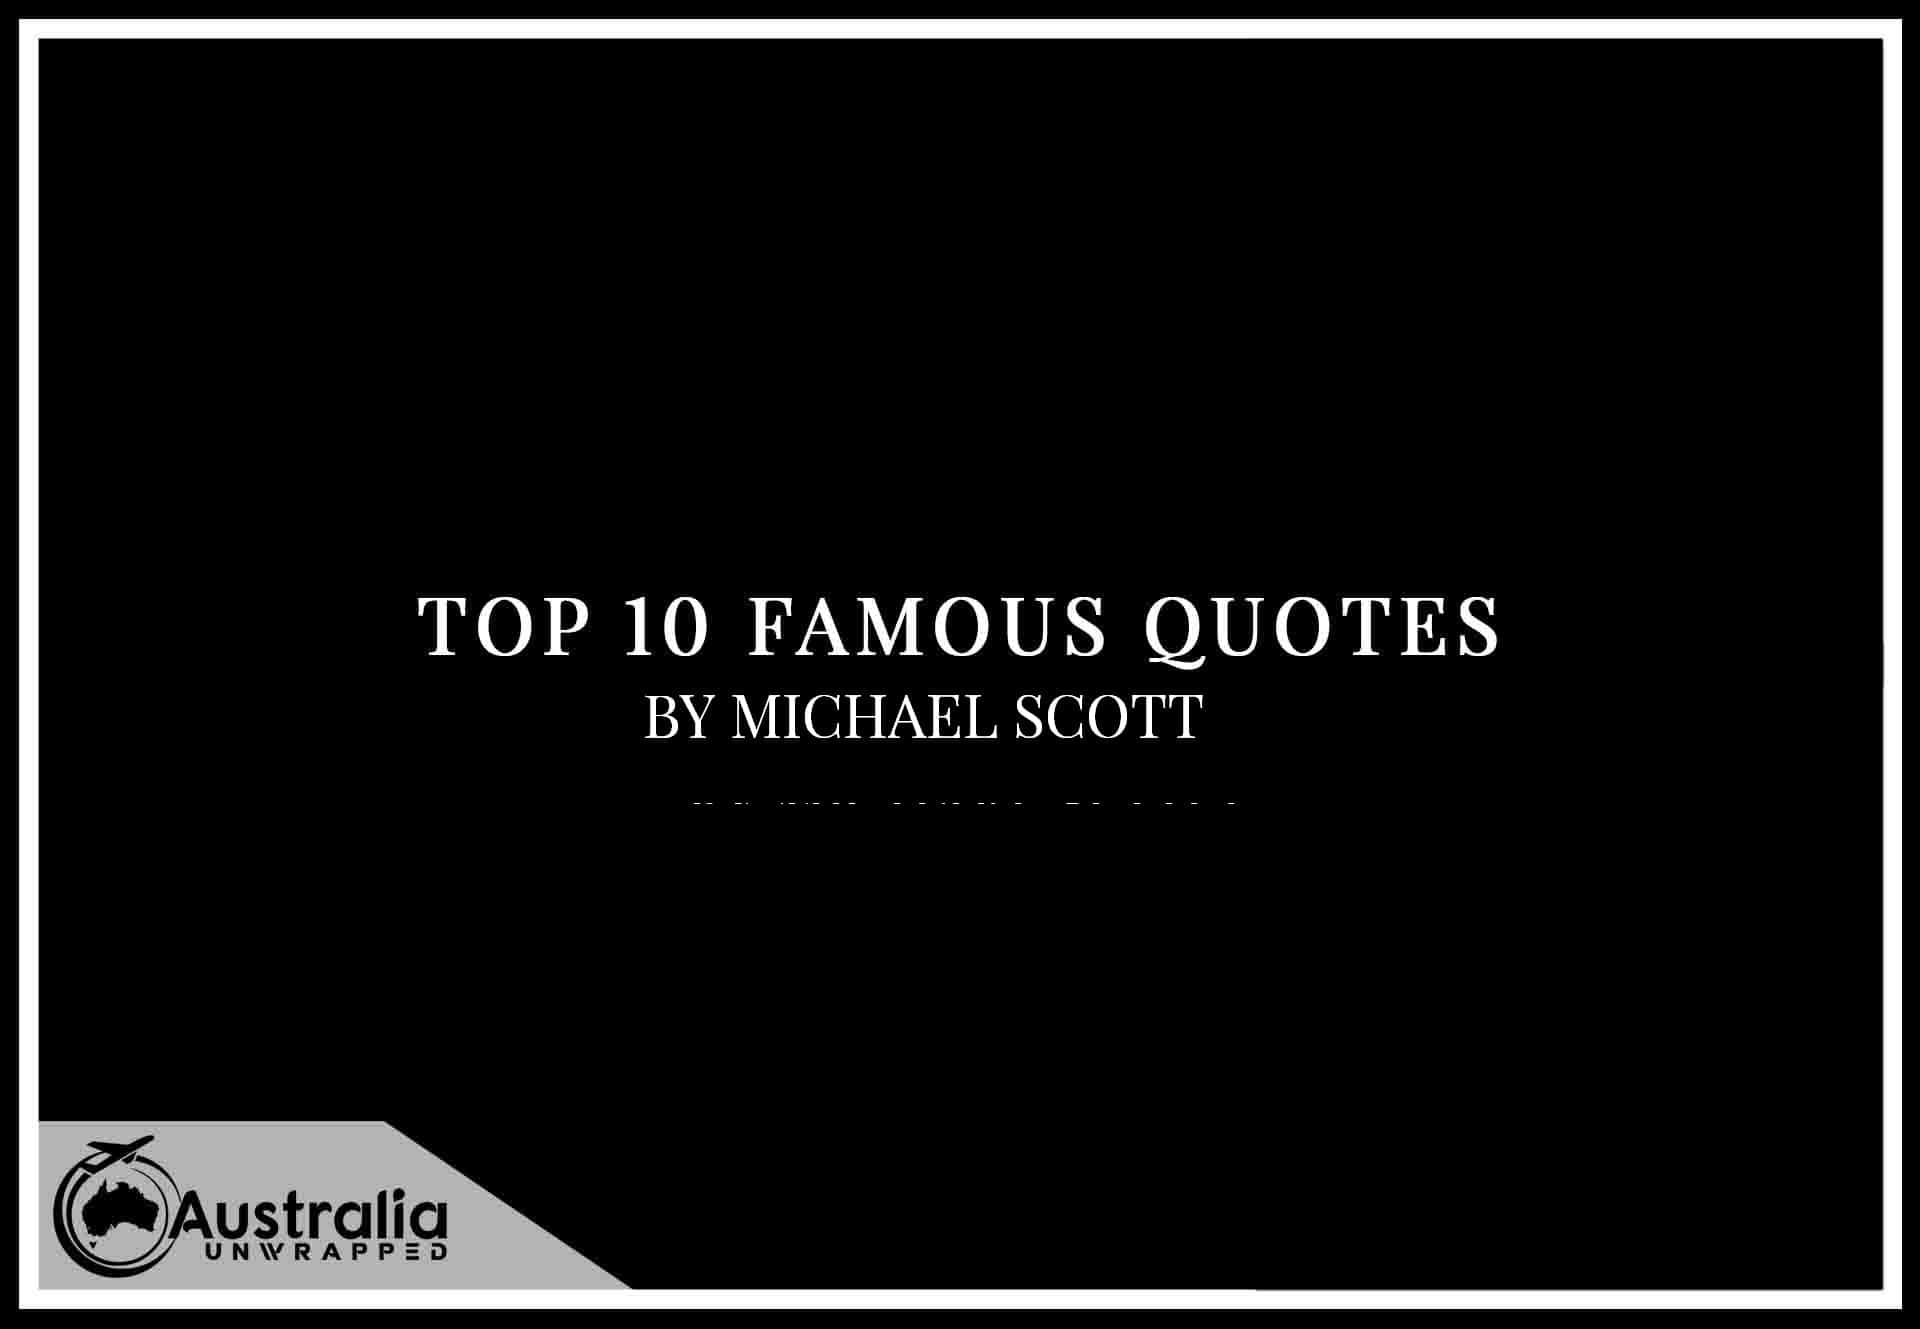 Top 10 Famous Quotes by Author Michael Scott